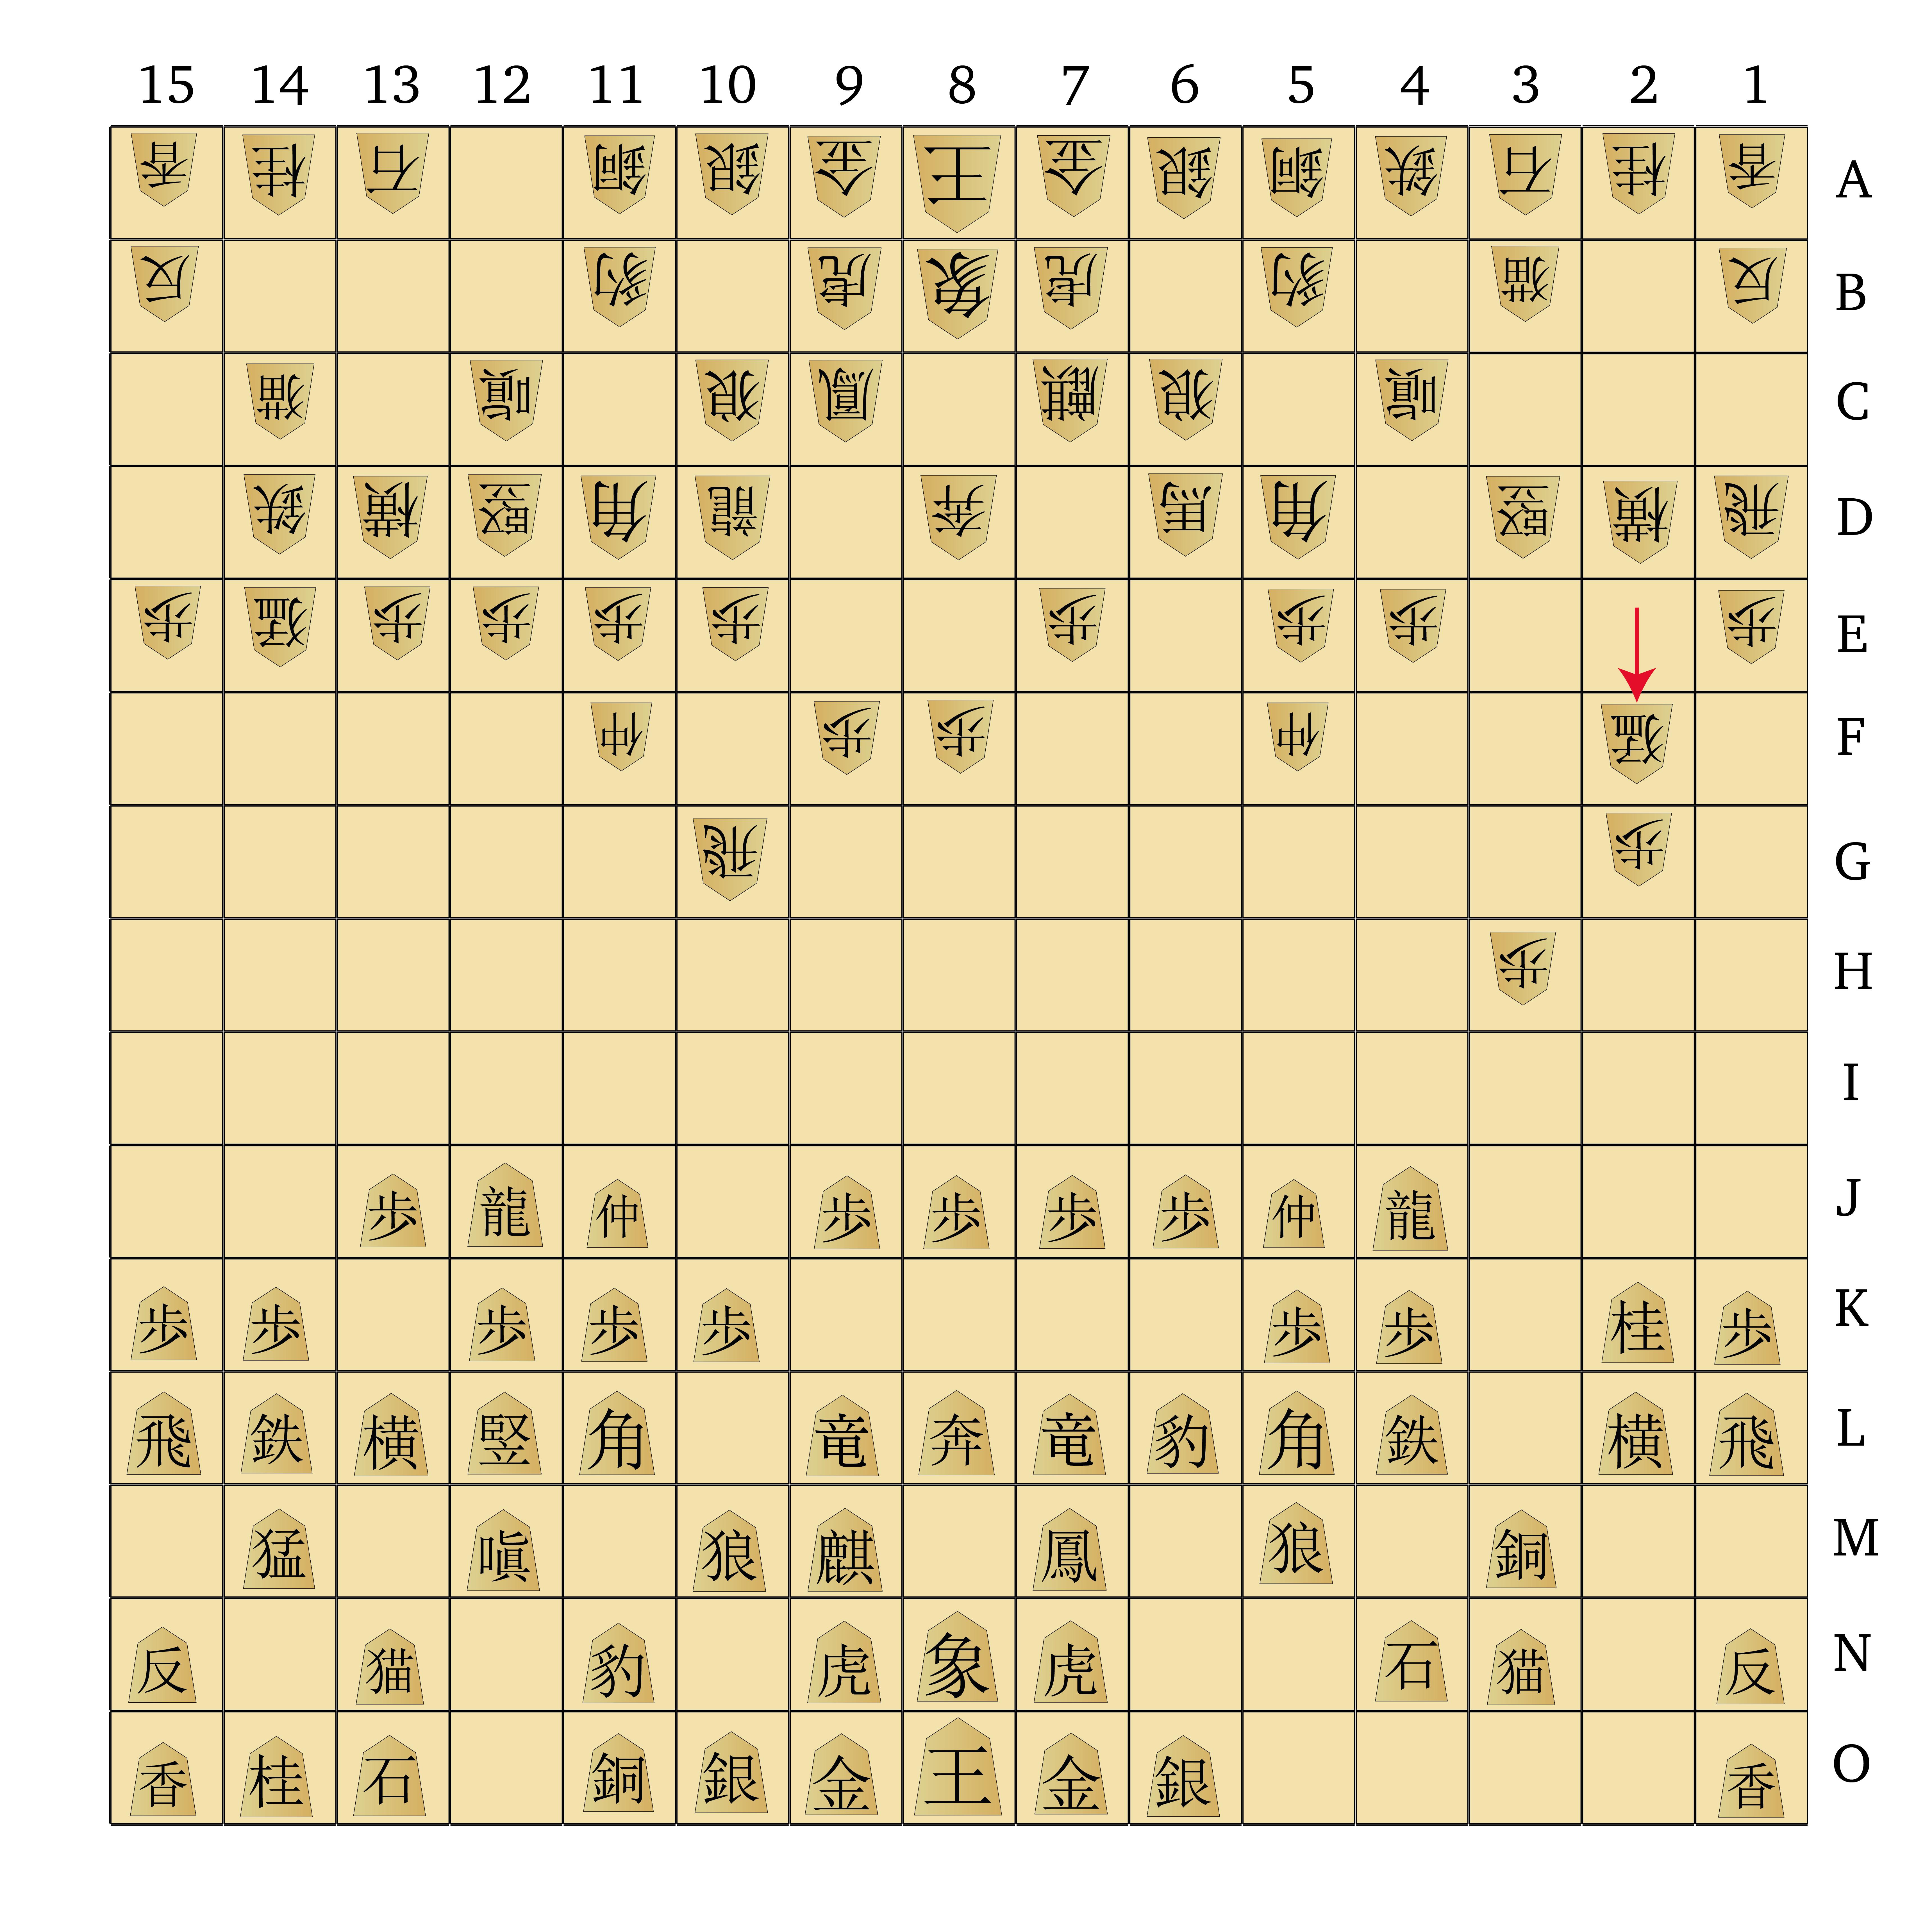 Dai Shogi 420 -- Move 90-01